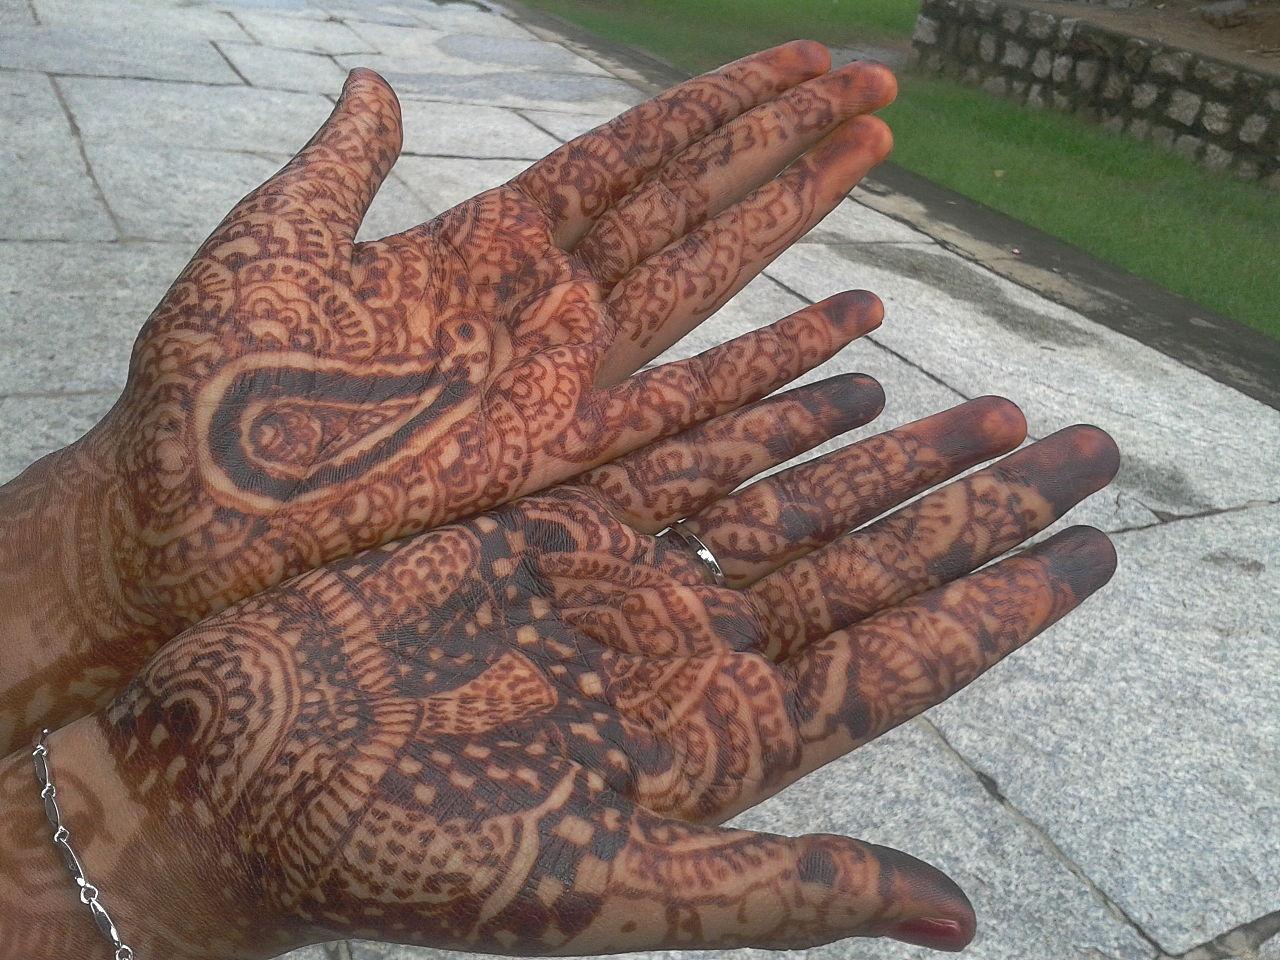 Mehndi Henna Wikipedia : Enjoy the beautiful artwork of mehndi henna india